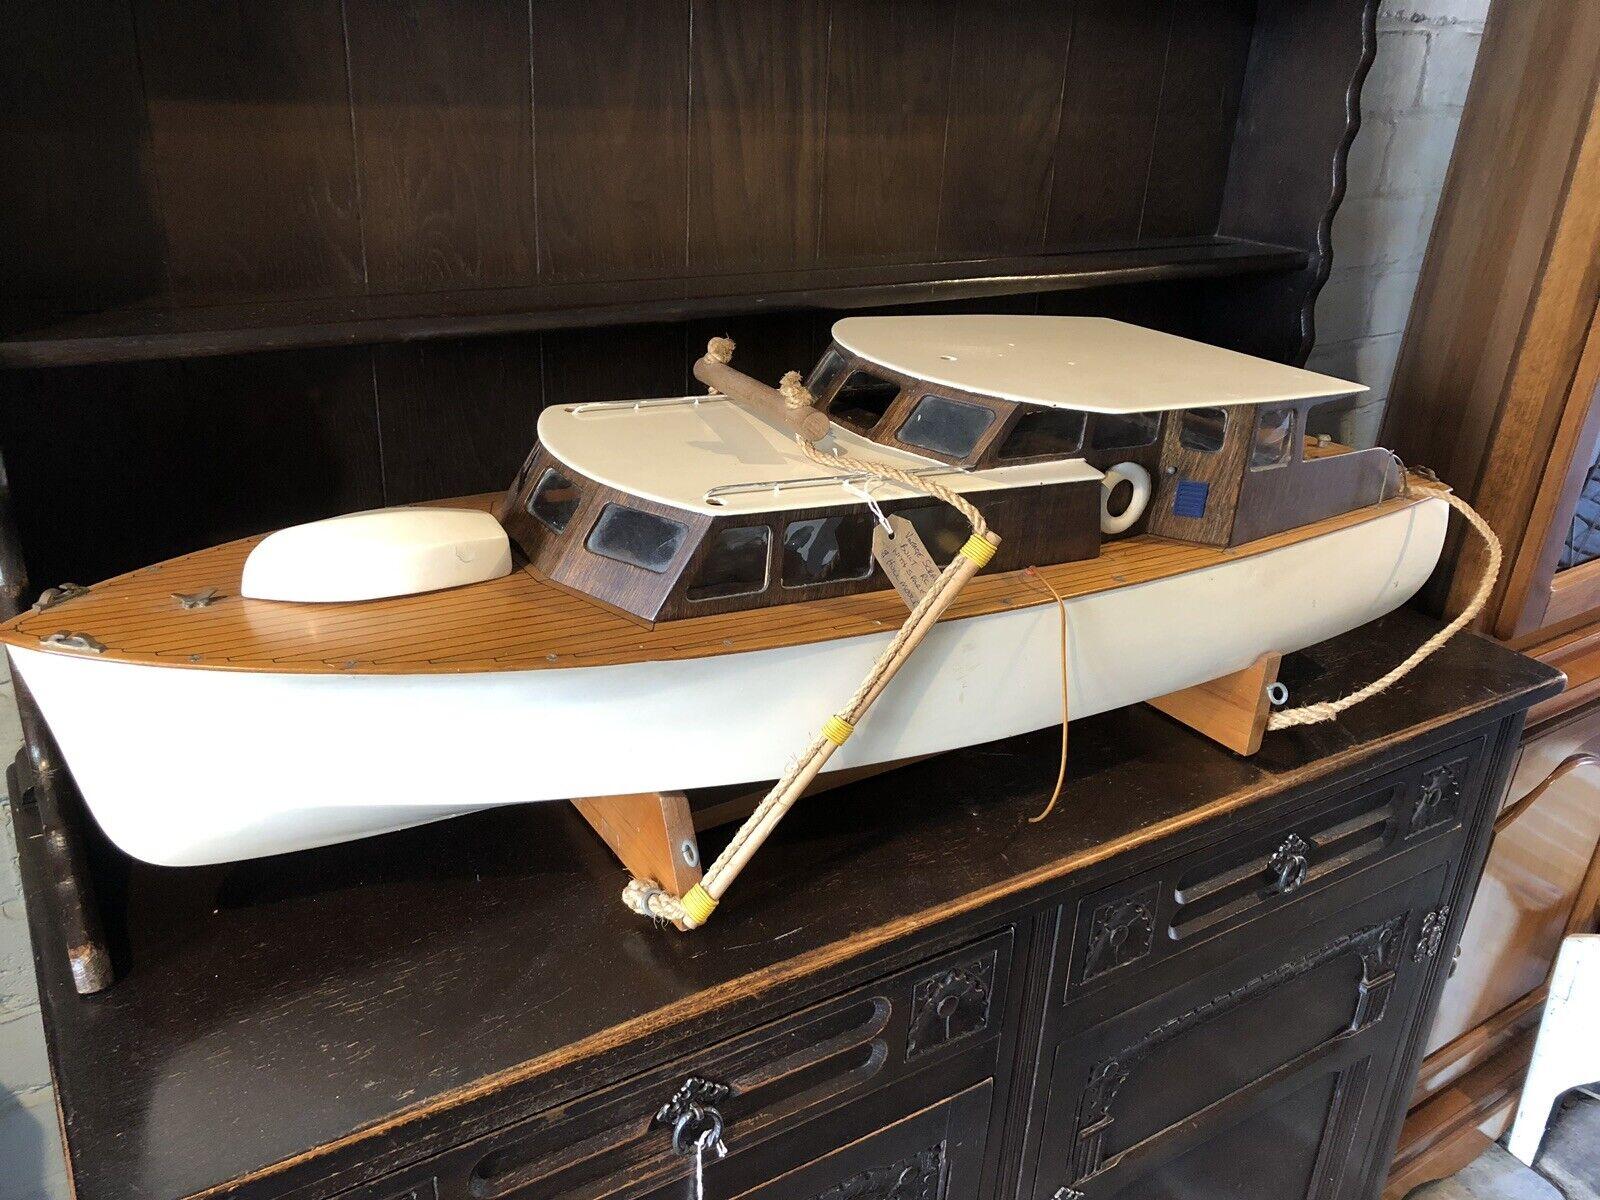 årgång Scratch Built Remote Control Motor Yacht modell California Built 1970 65533;